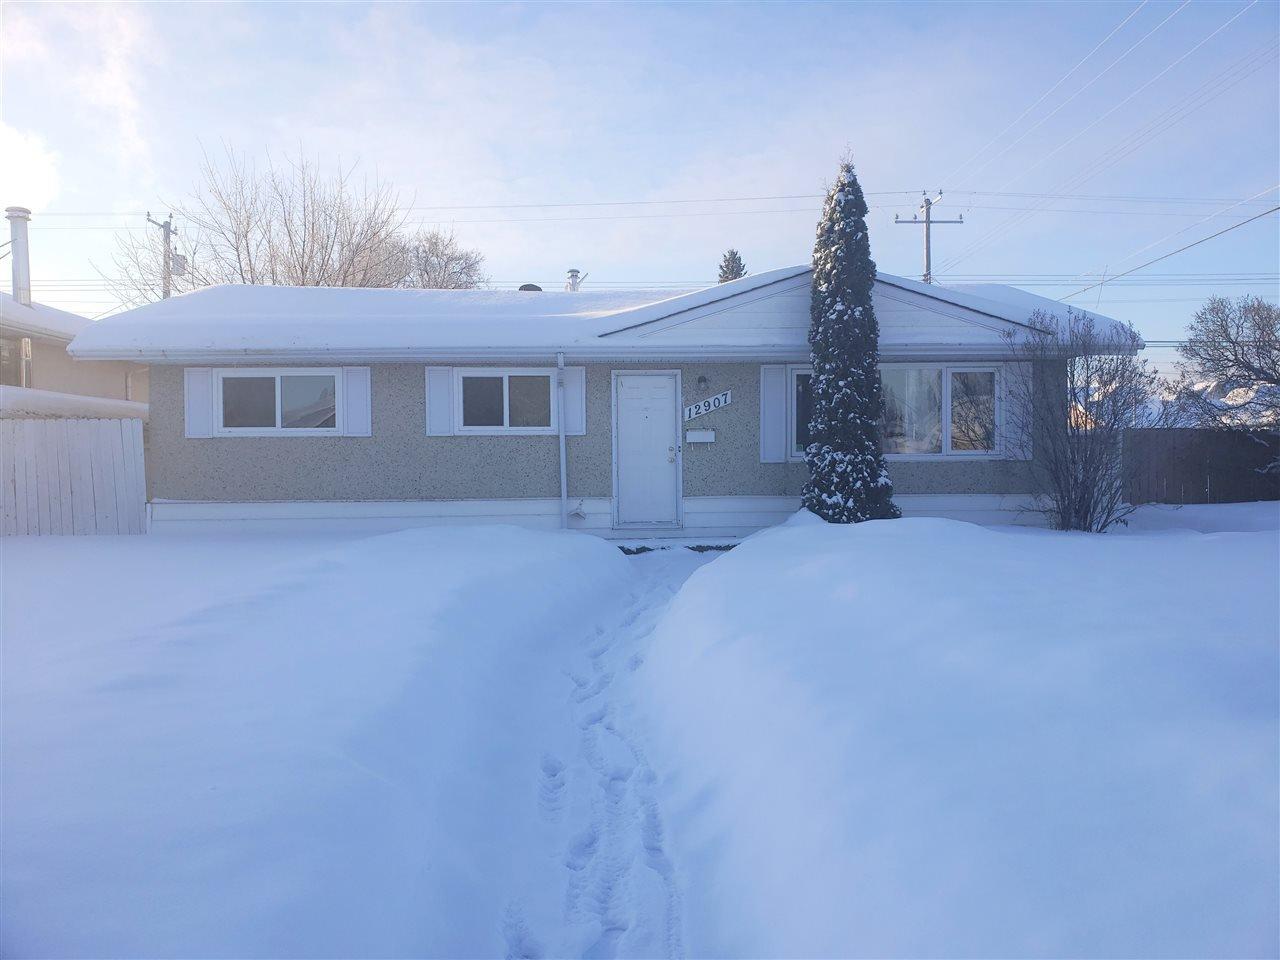 Main Photo: 12907 133 Avenue in Edmonton: Zone 01 House for sale : MLS®# E4187852